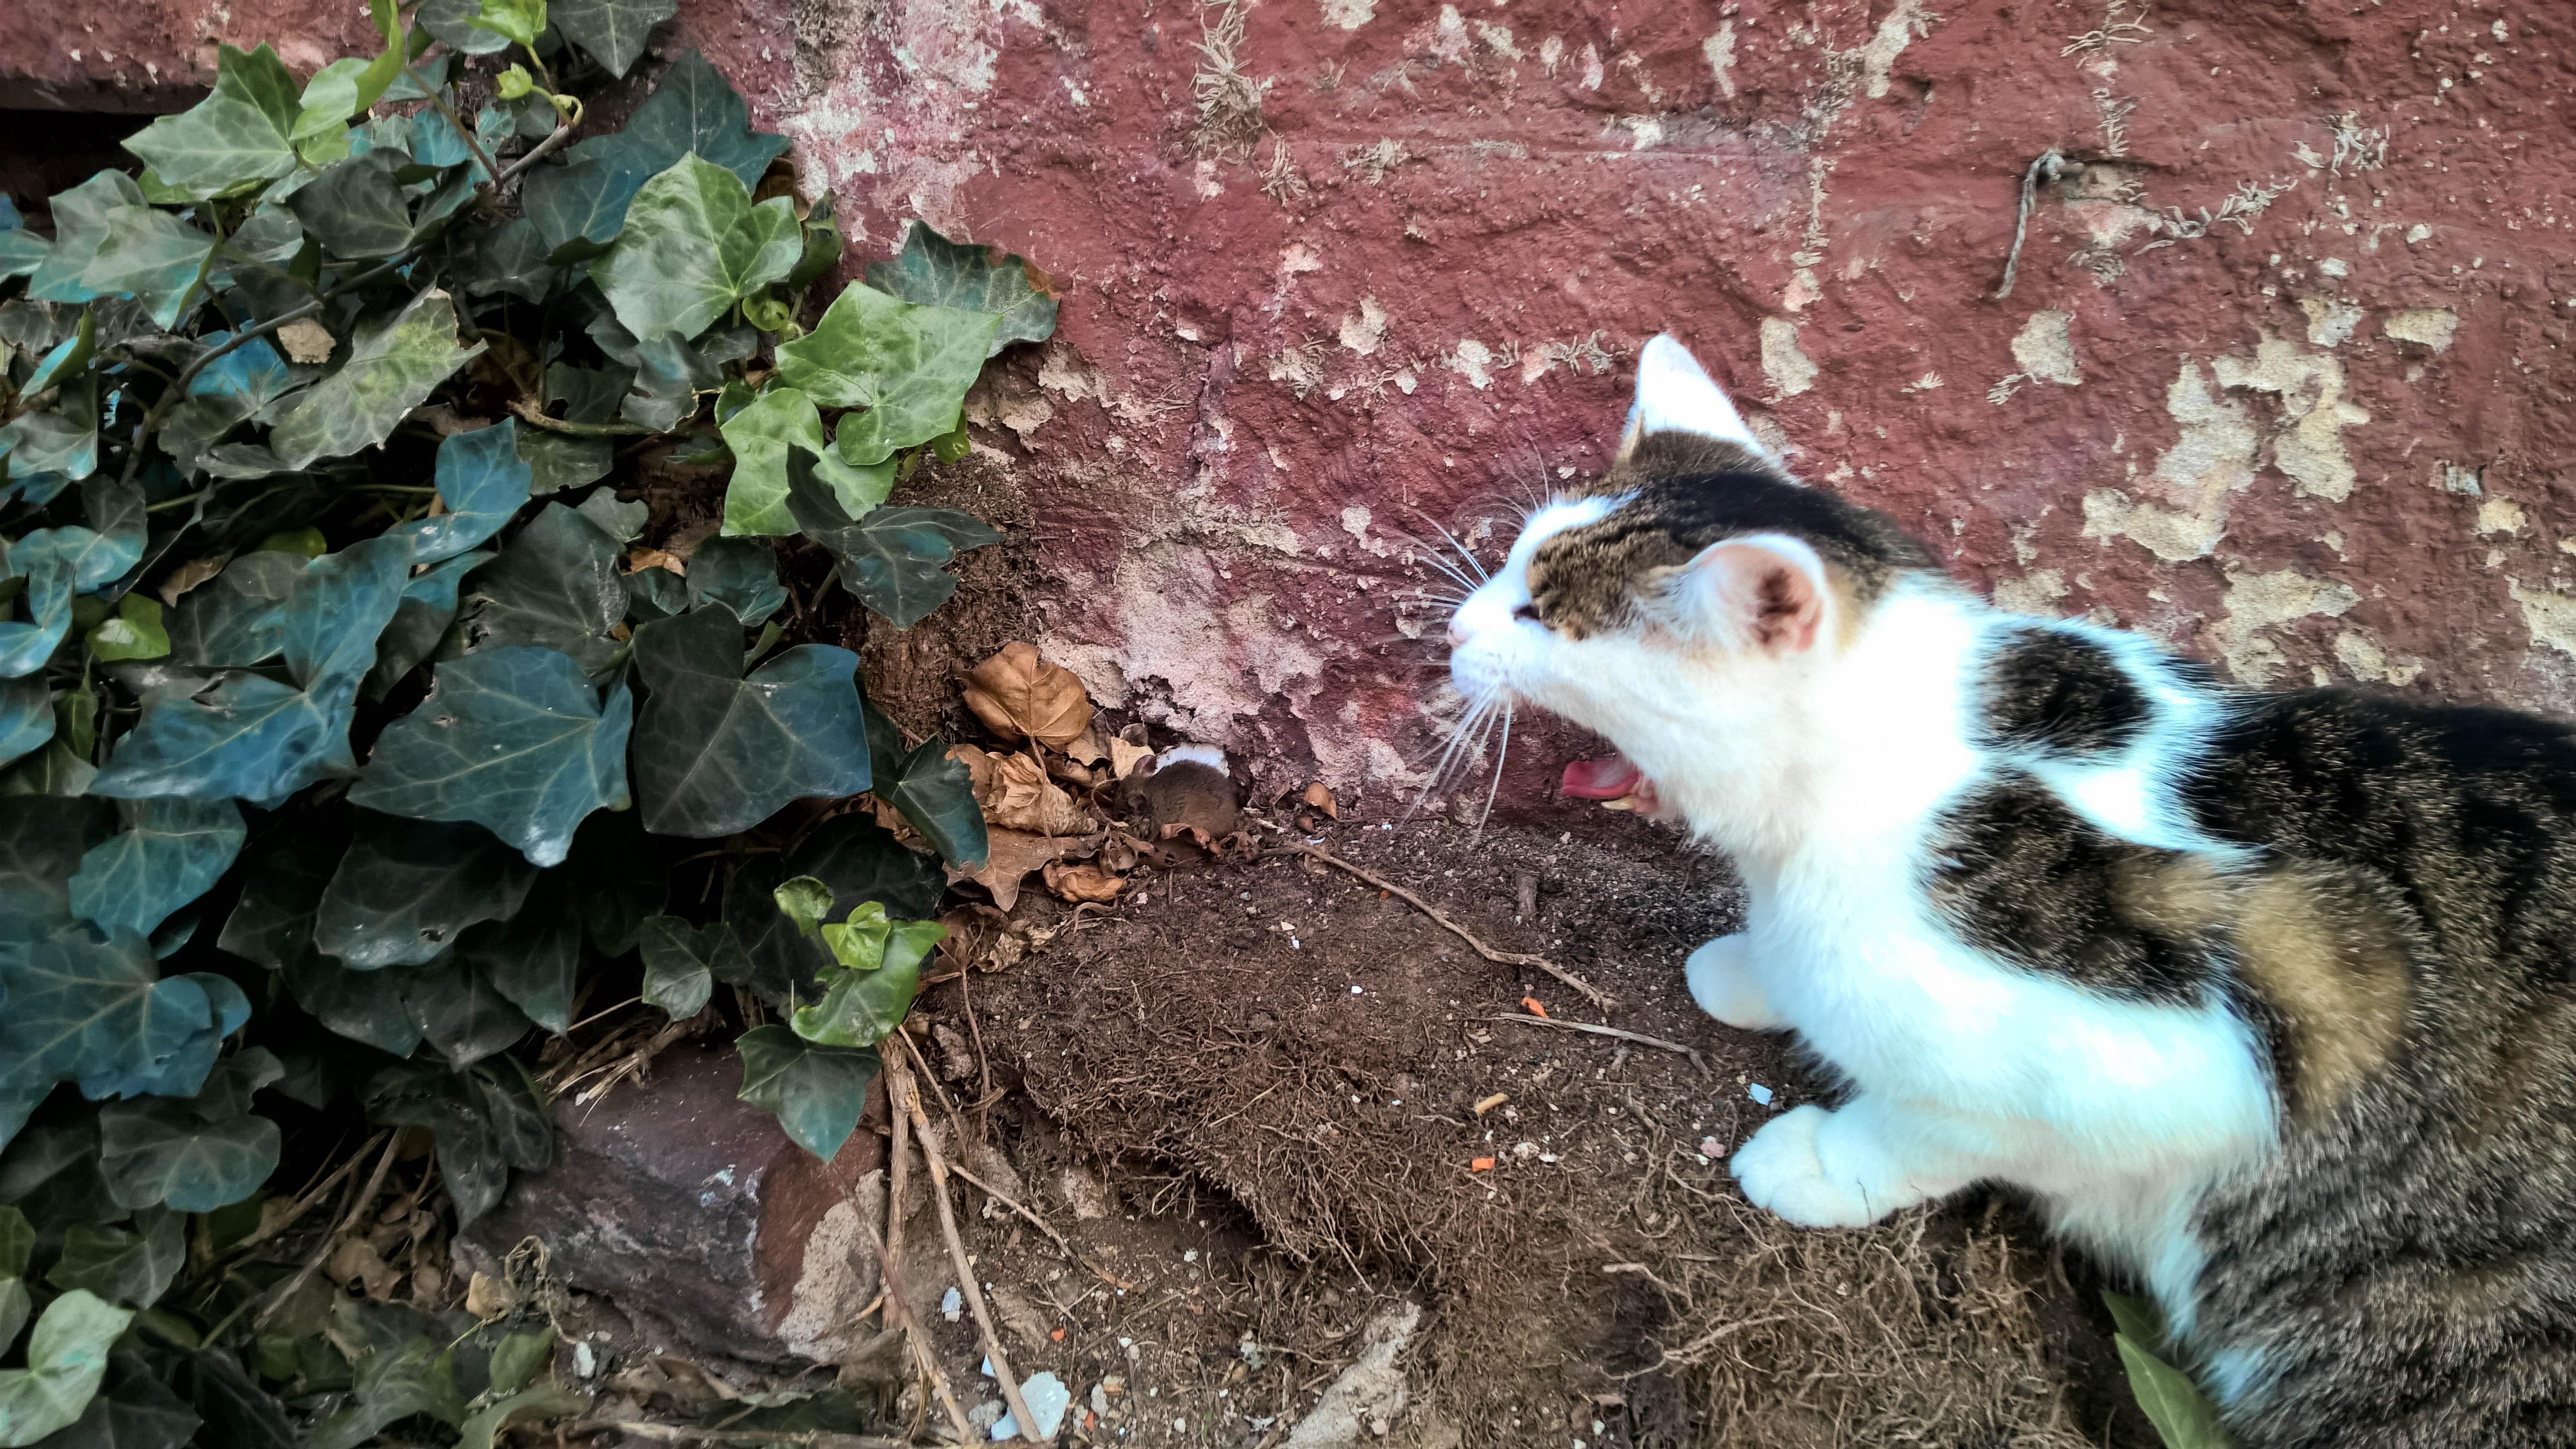 Nokia Lumia 1520 Photo Example - Cat and Mouse